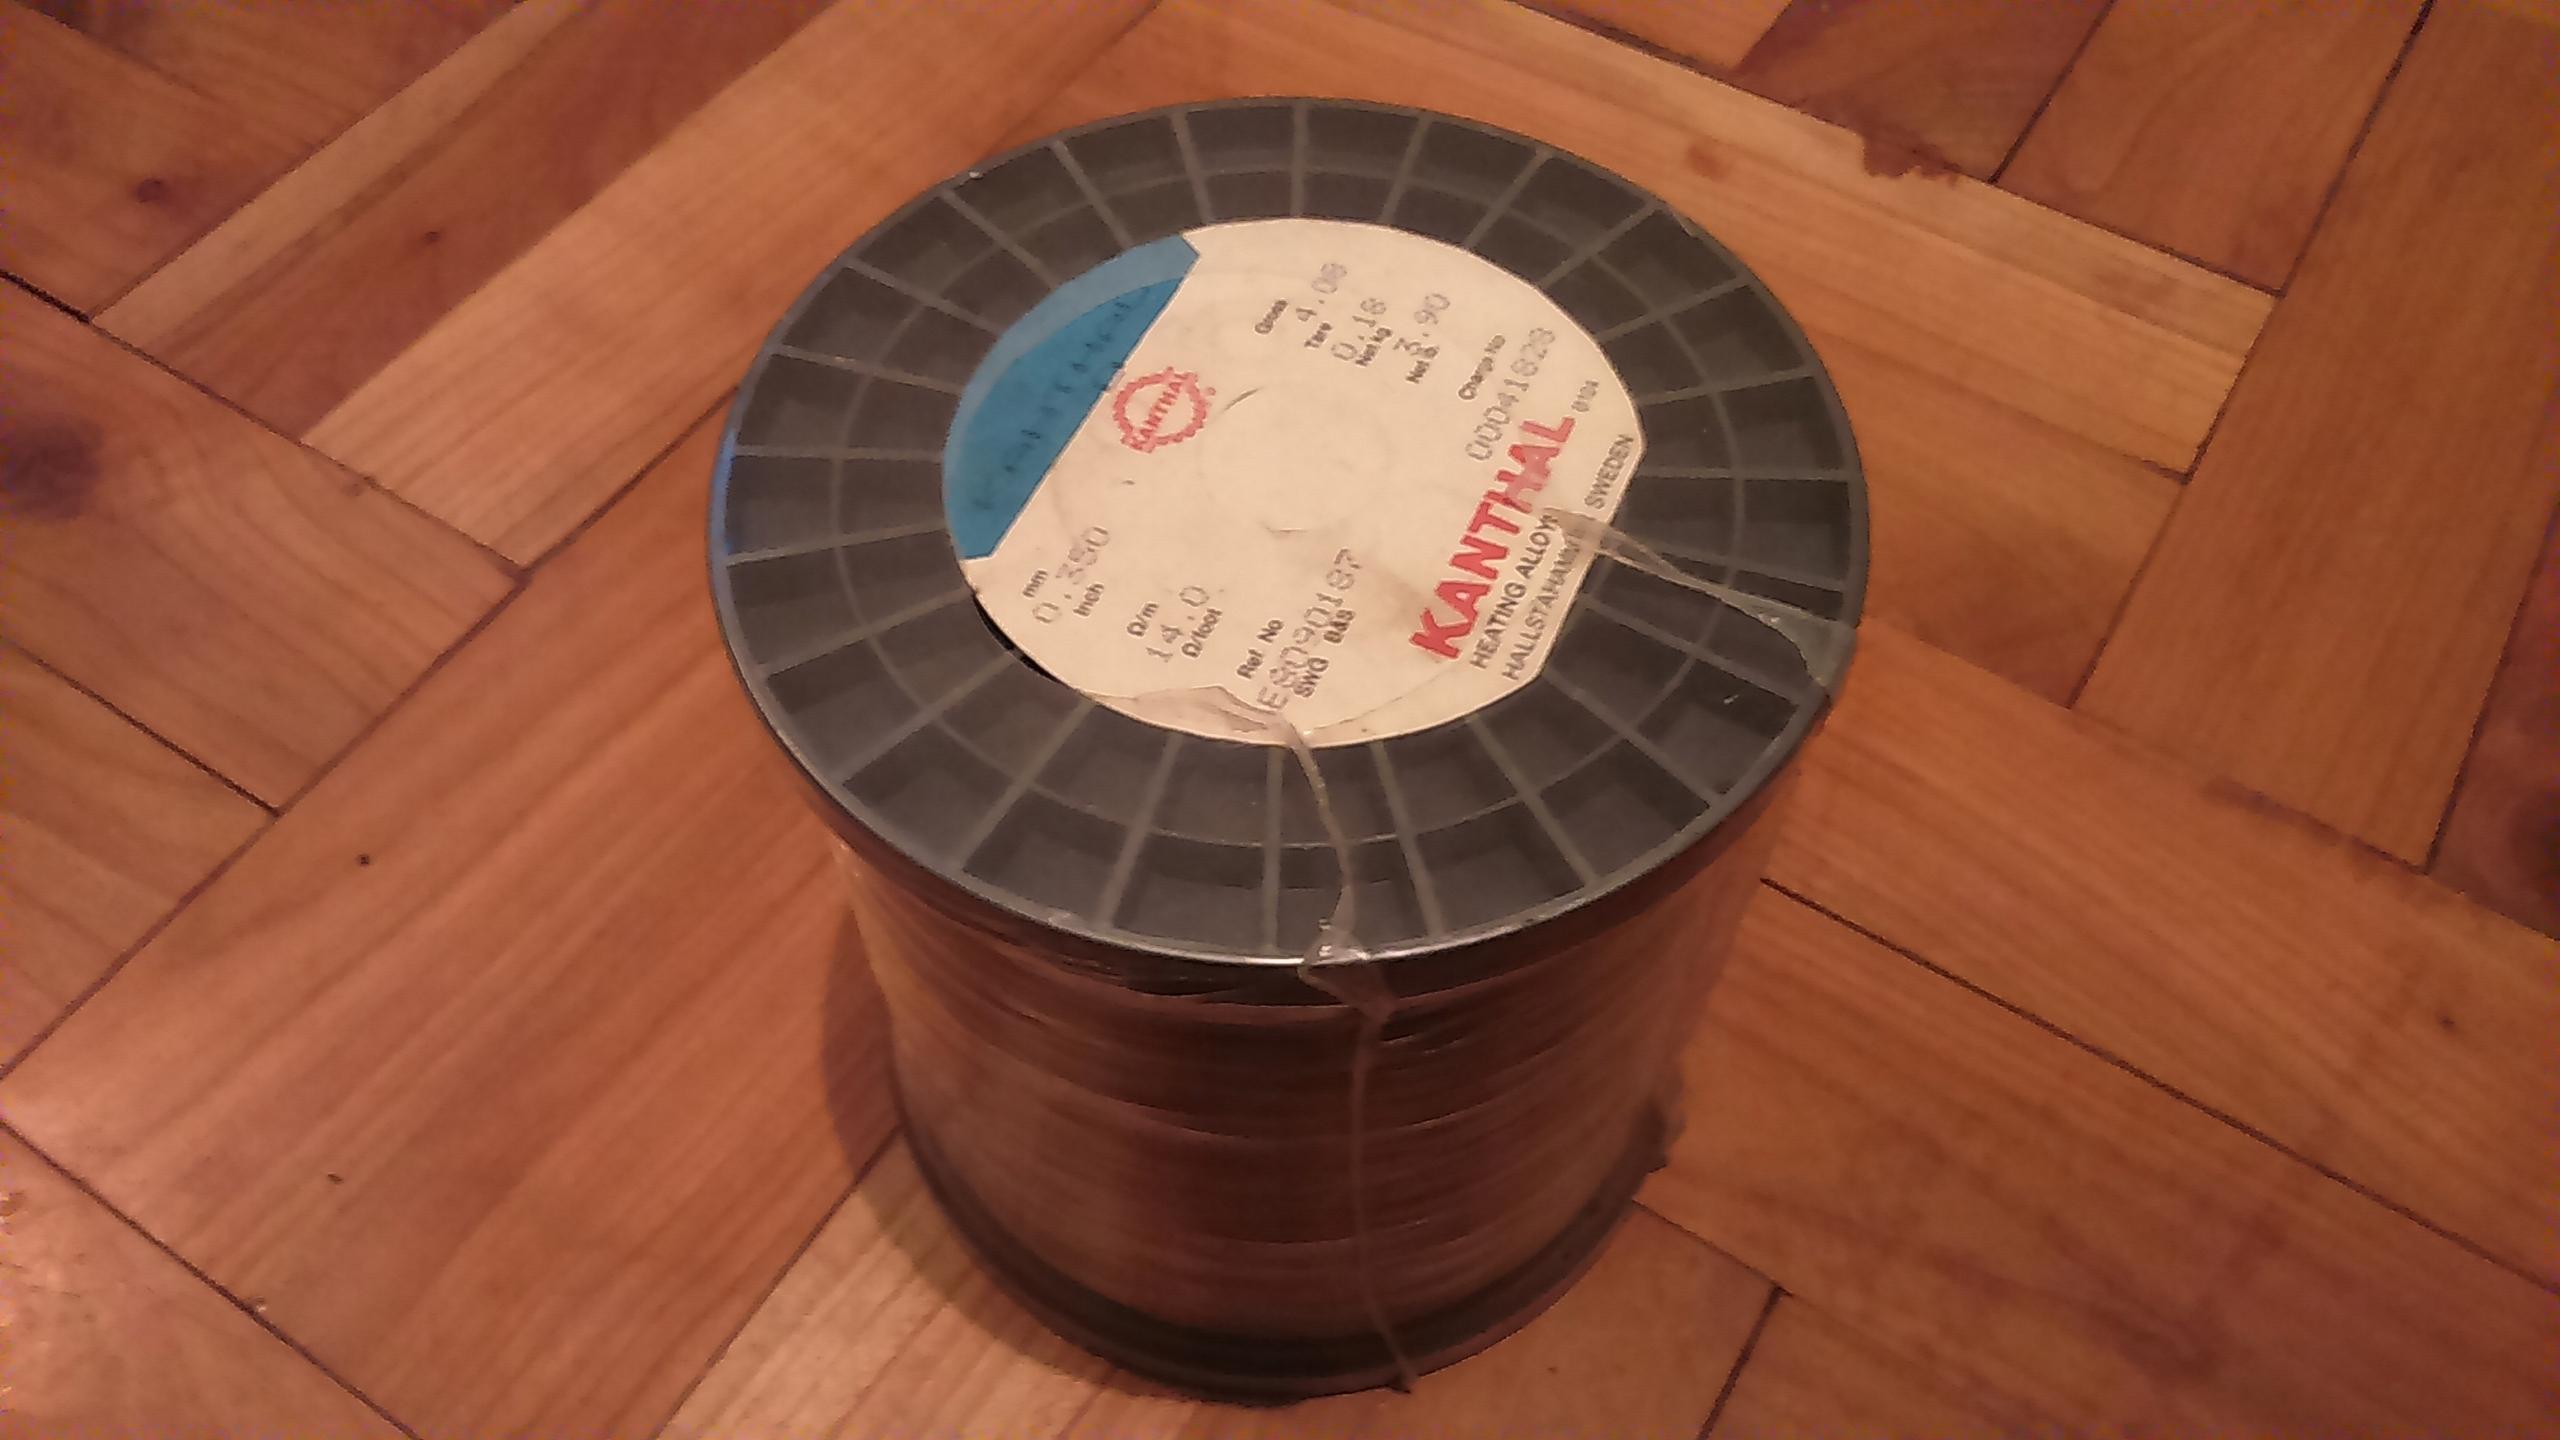 drut kanthal średnica 0,35 cała szpula waga 4kg